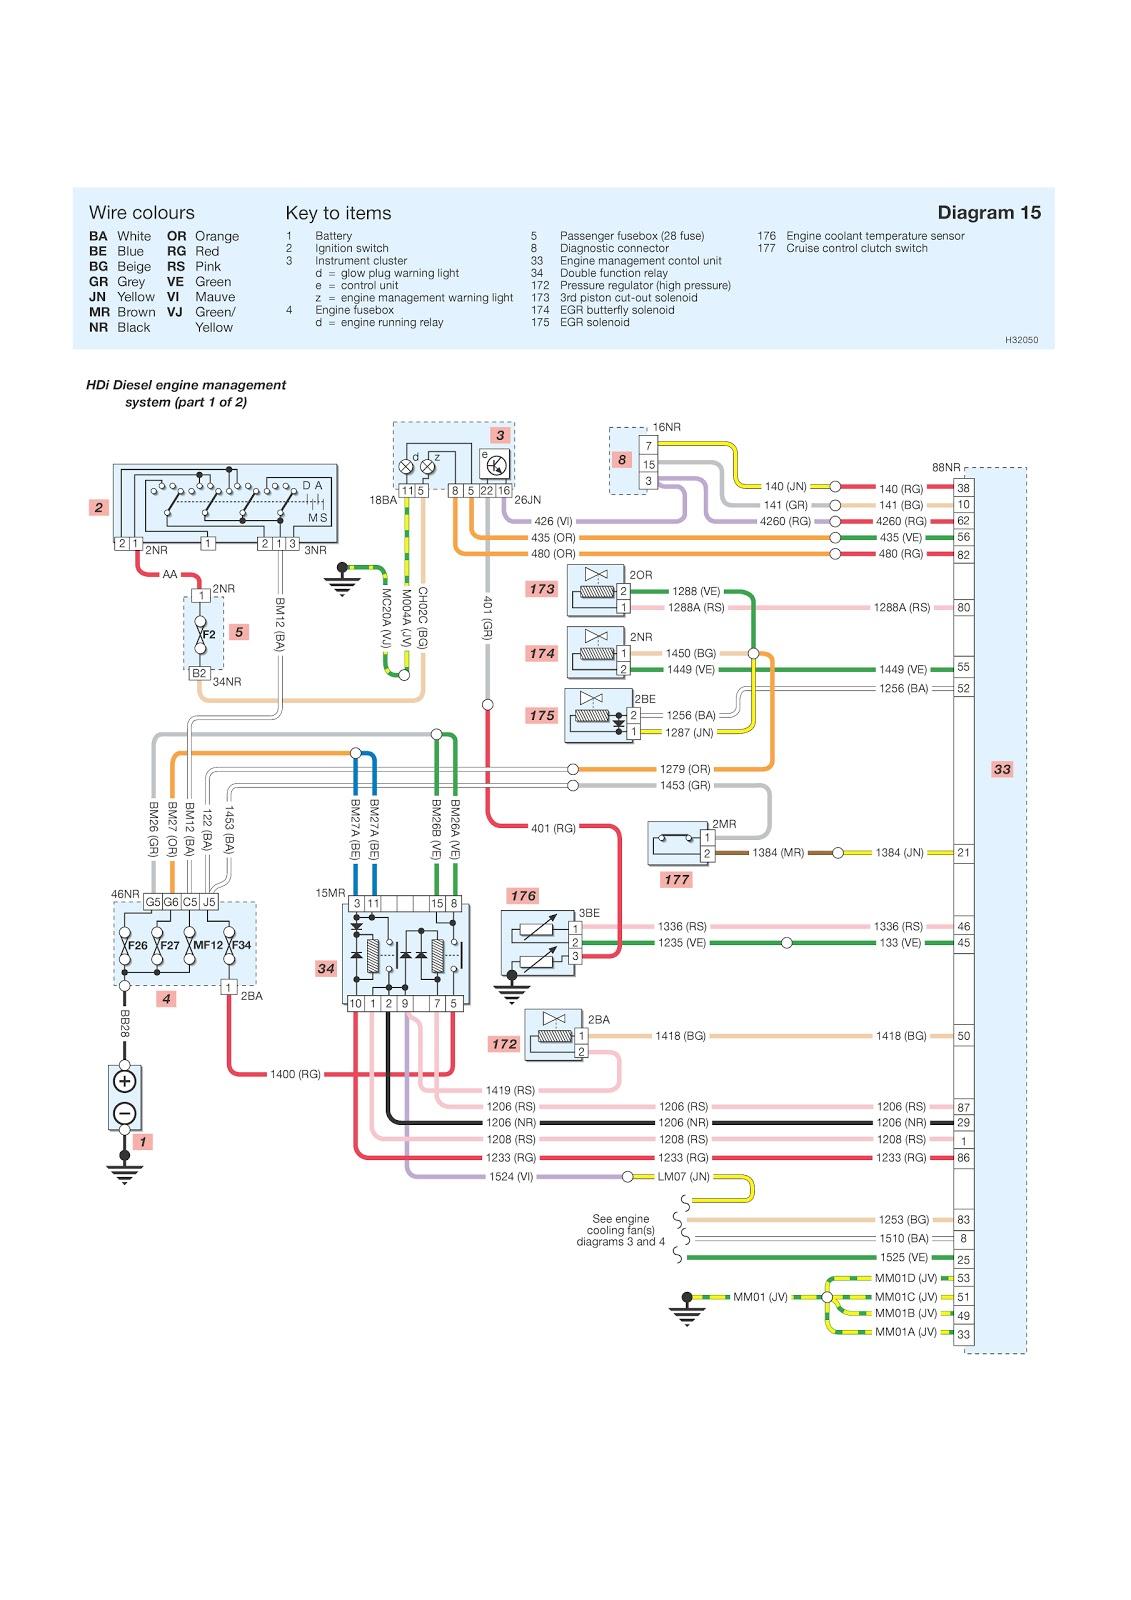 peugeot 206 wiring diagram 2009 ford explorer hdi diesel engine management system